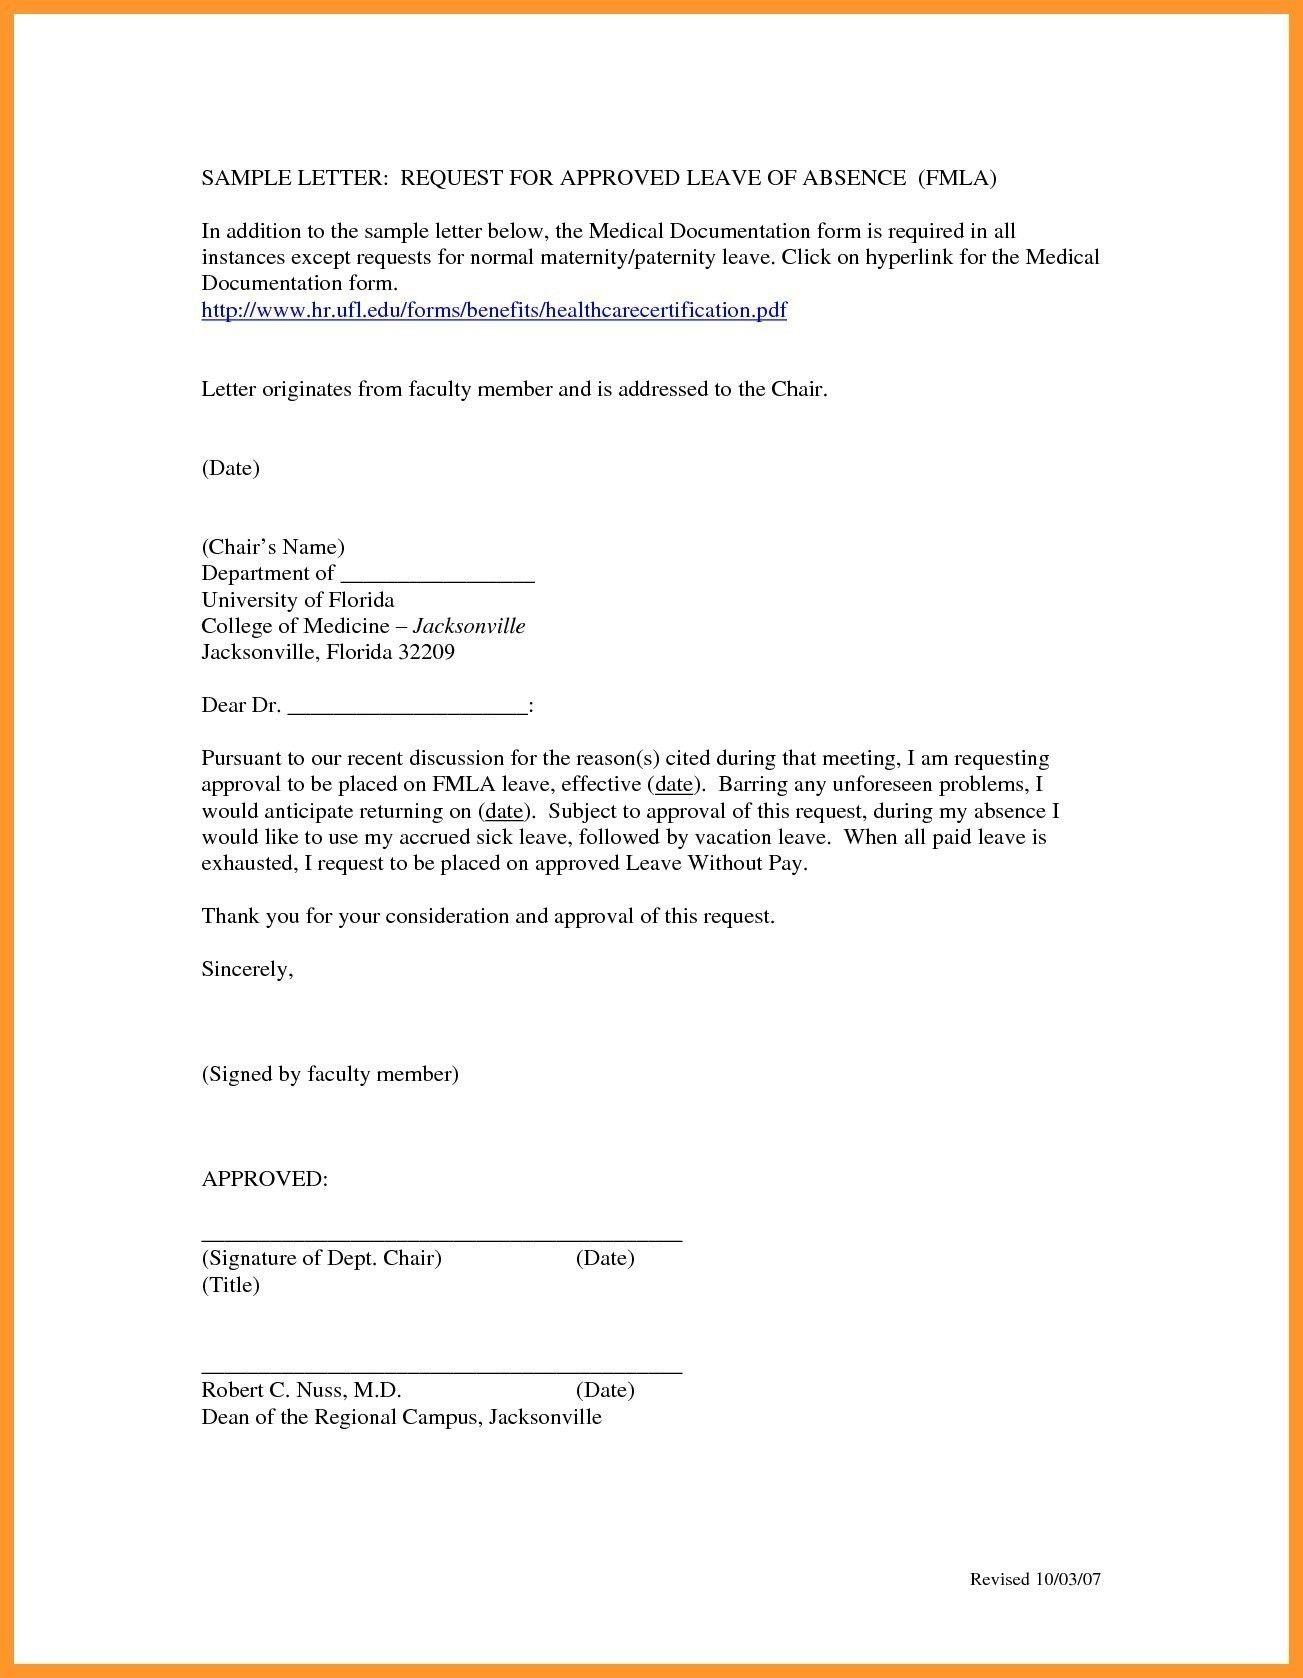 b48b80dc912a346ed648c47f4783bb6a - How To Write Paternity Leave Application